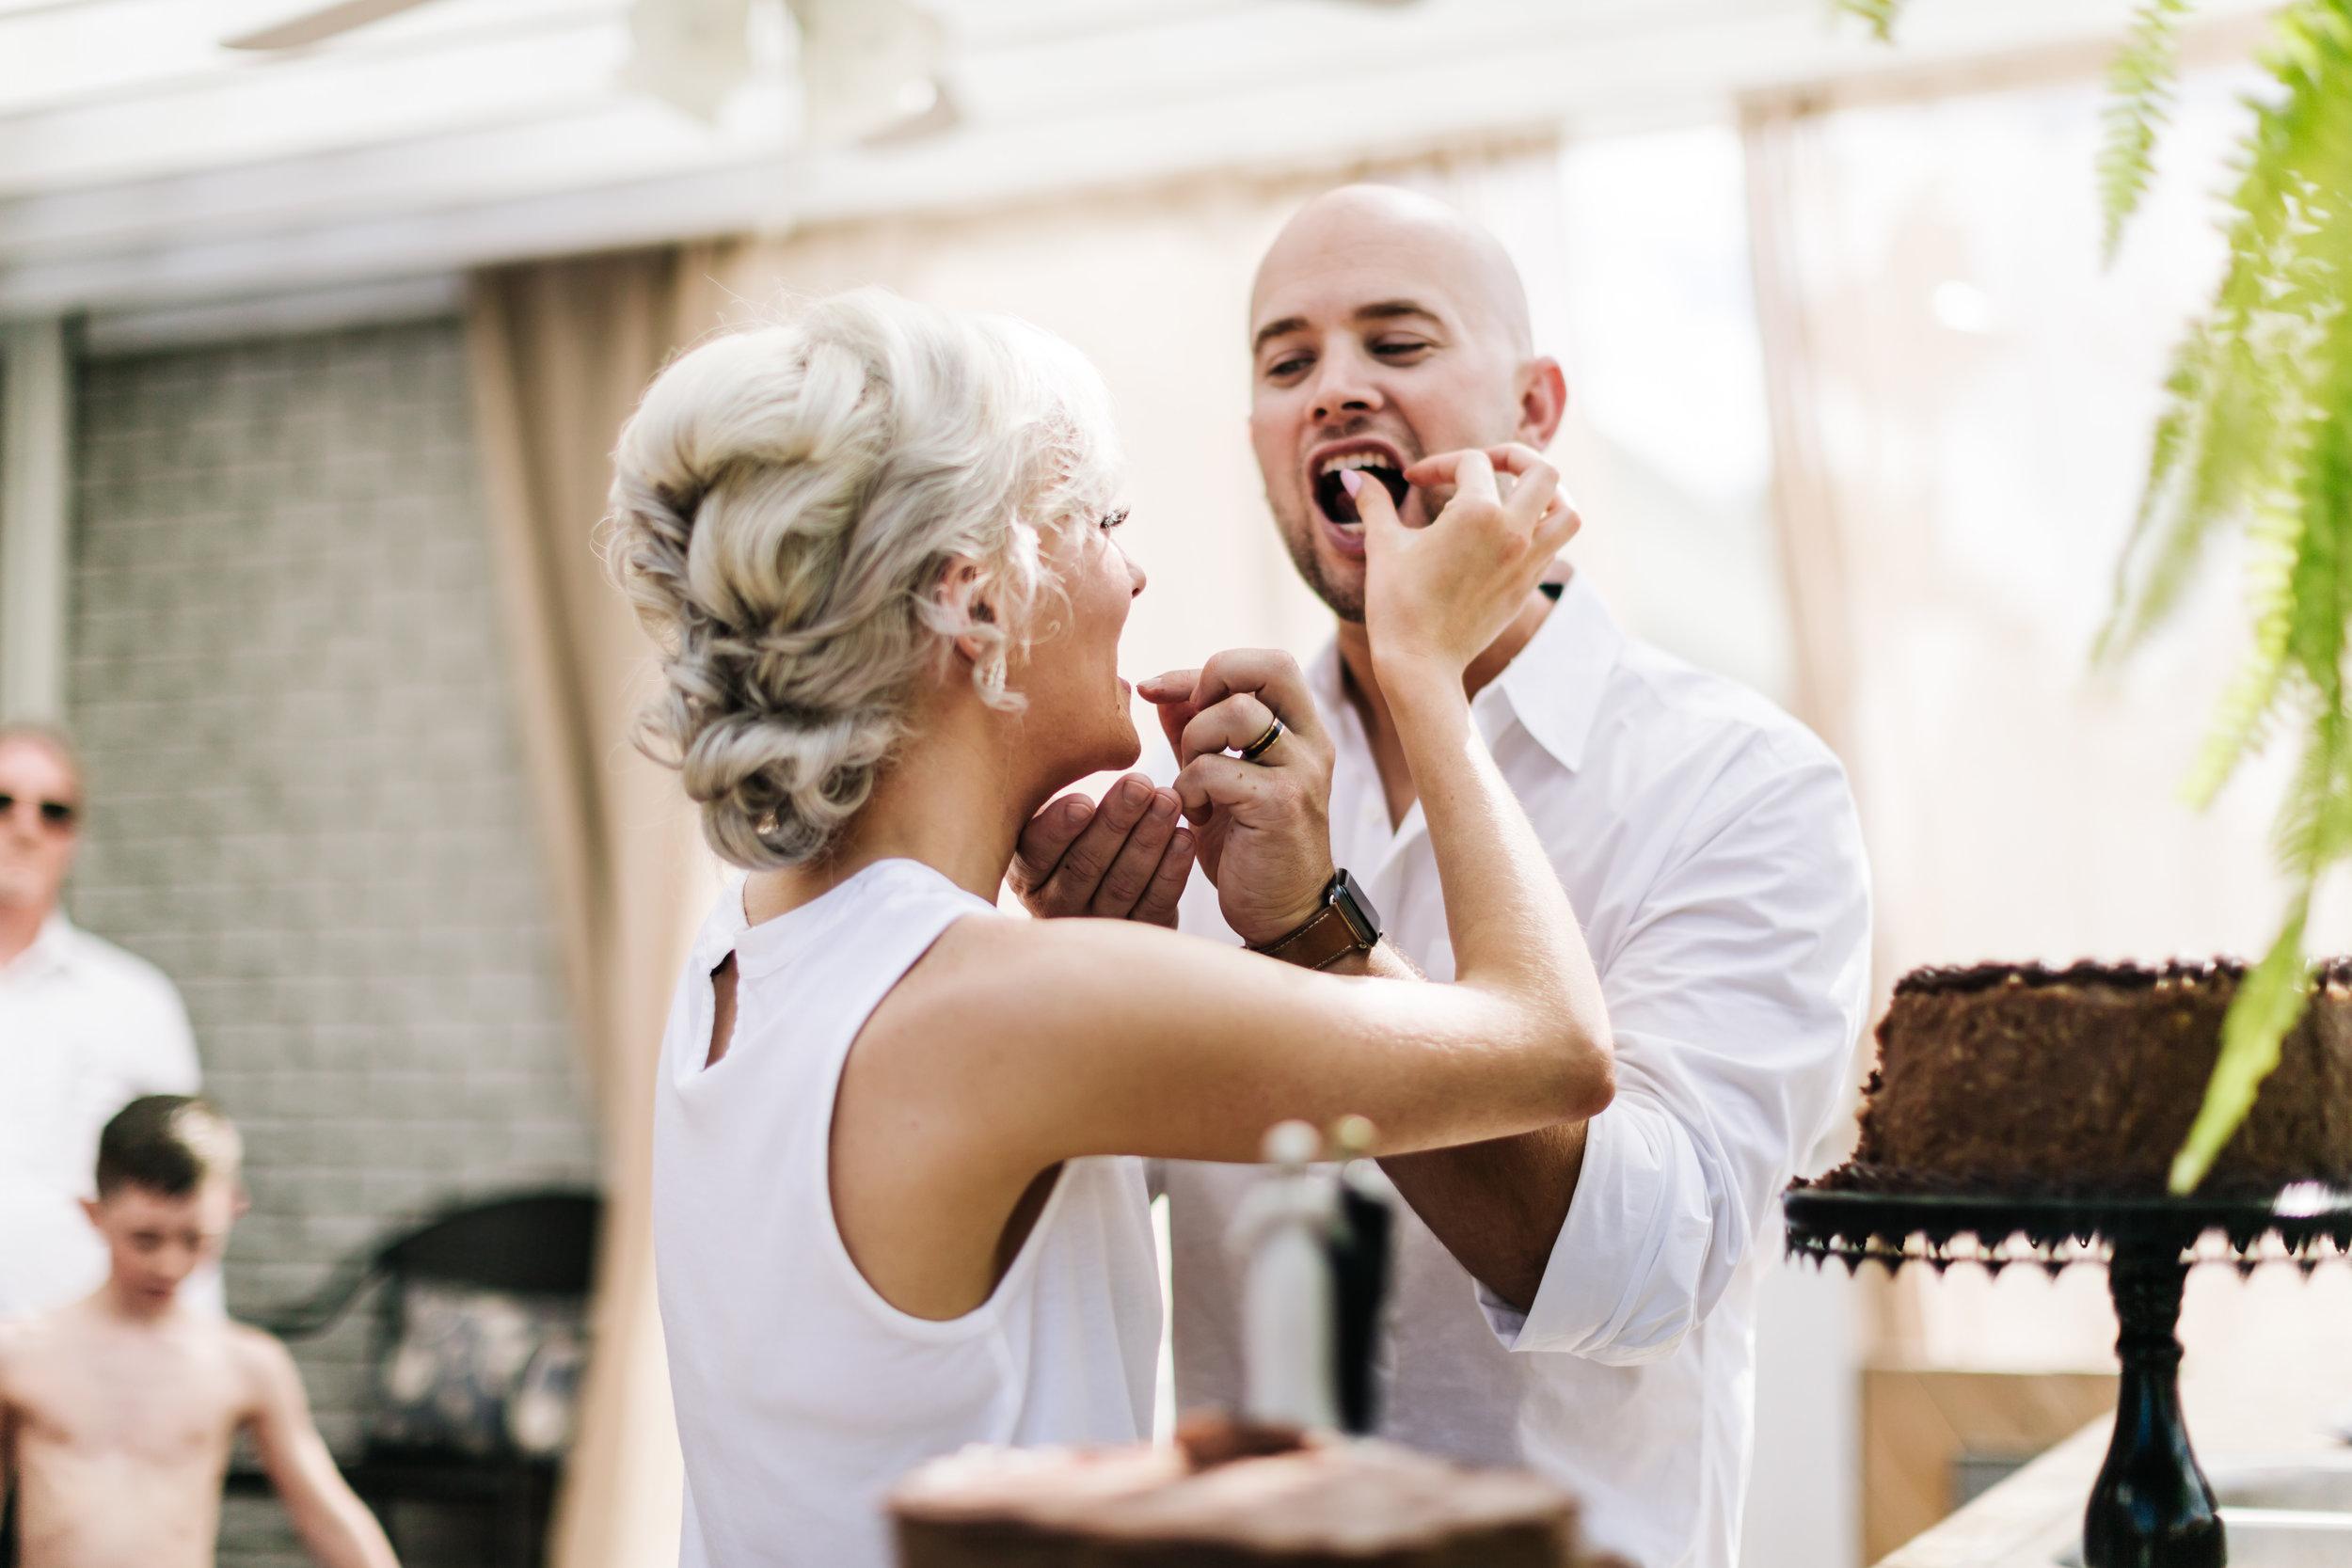 2018.09.02 Ray and Sarah Prizner Nashville TN Wedding FINALS-520.jpg